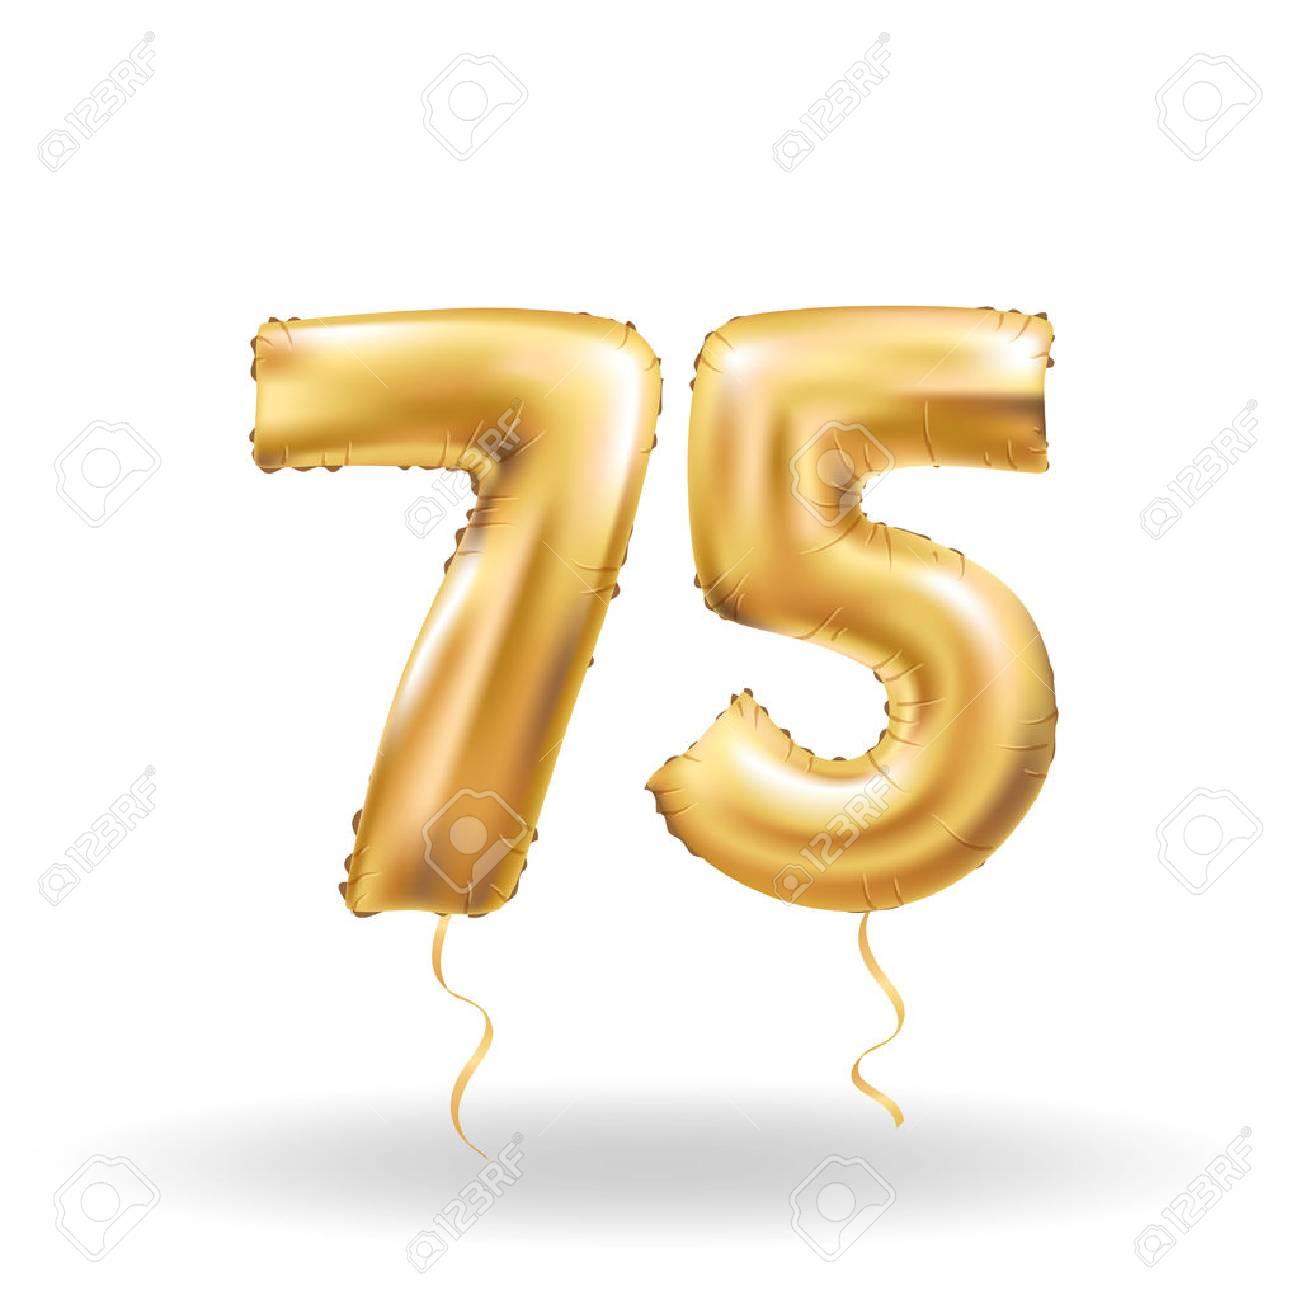 number seventy five metallic balloon - 75078979